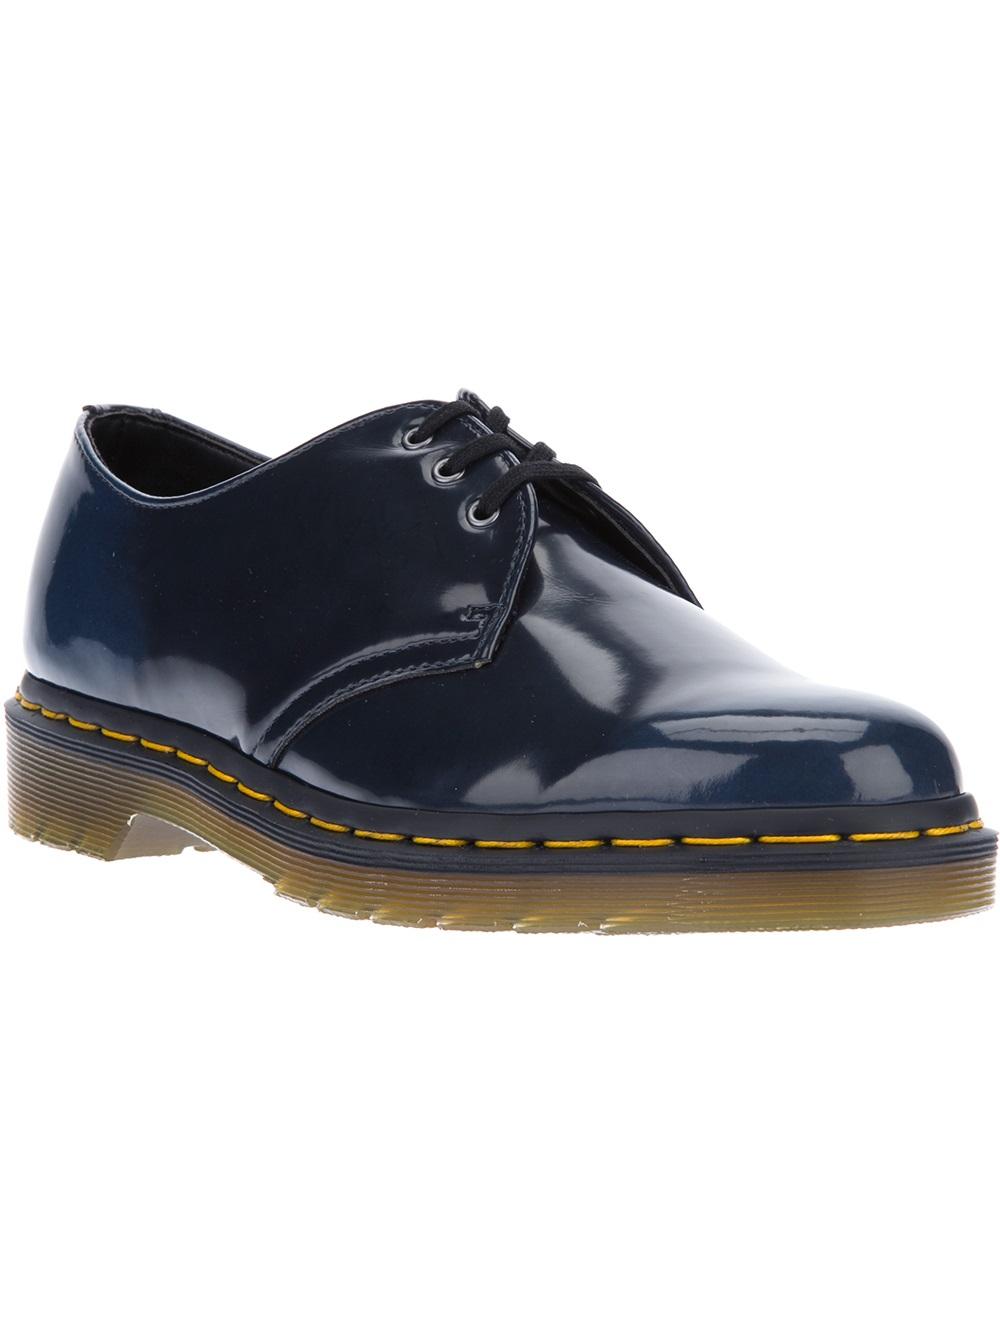 Shoe Brand With Yellow Stitching